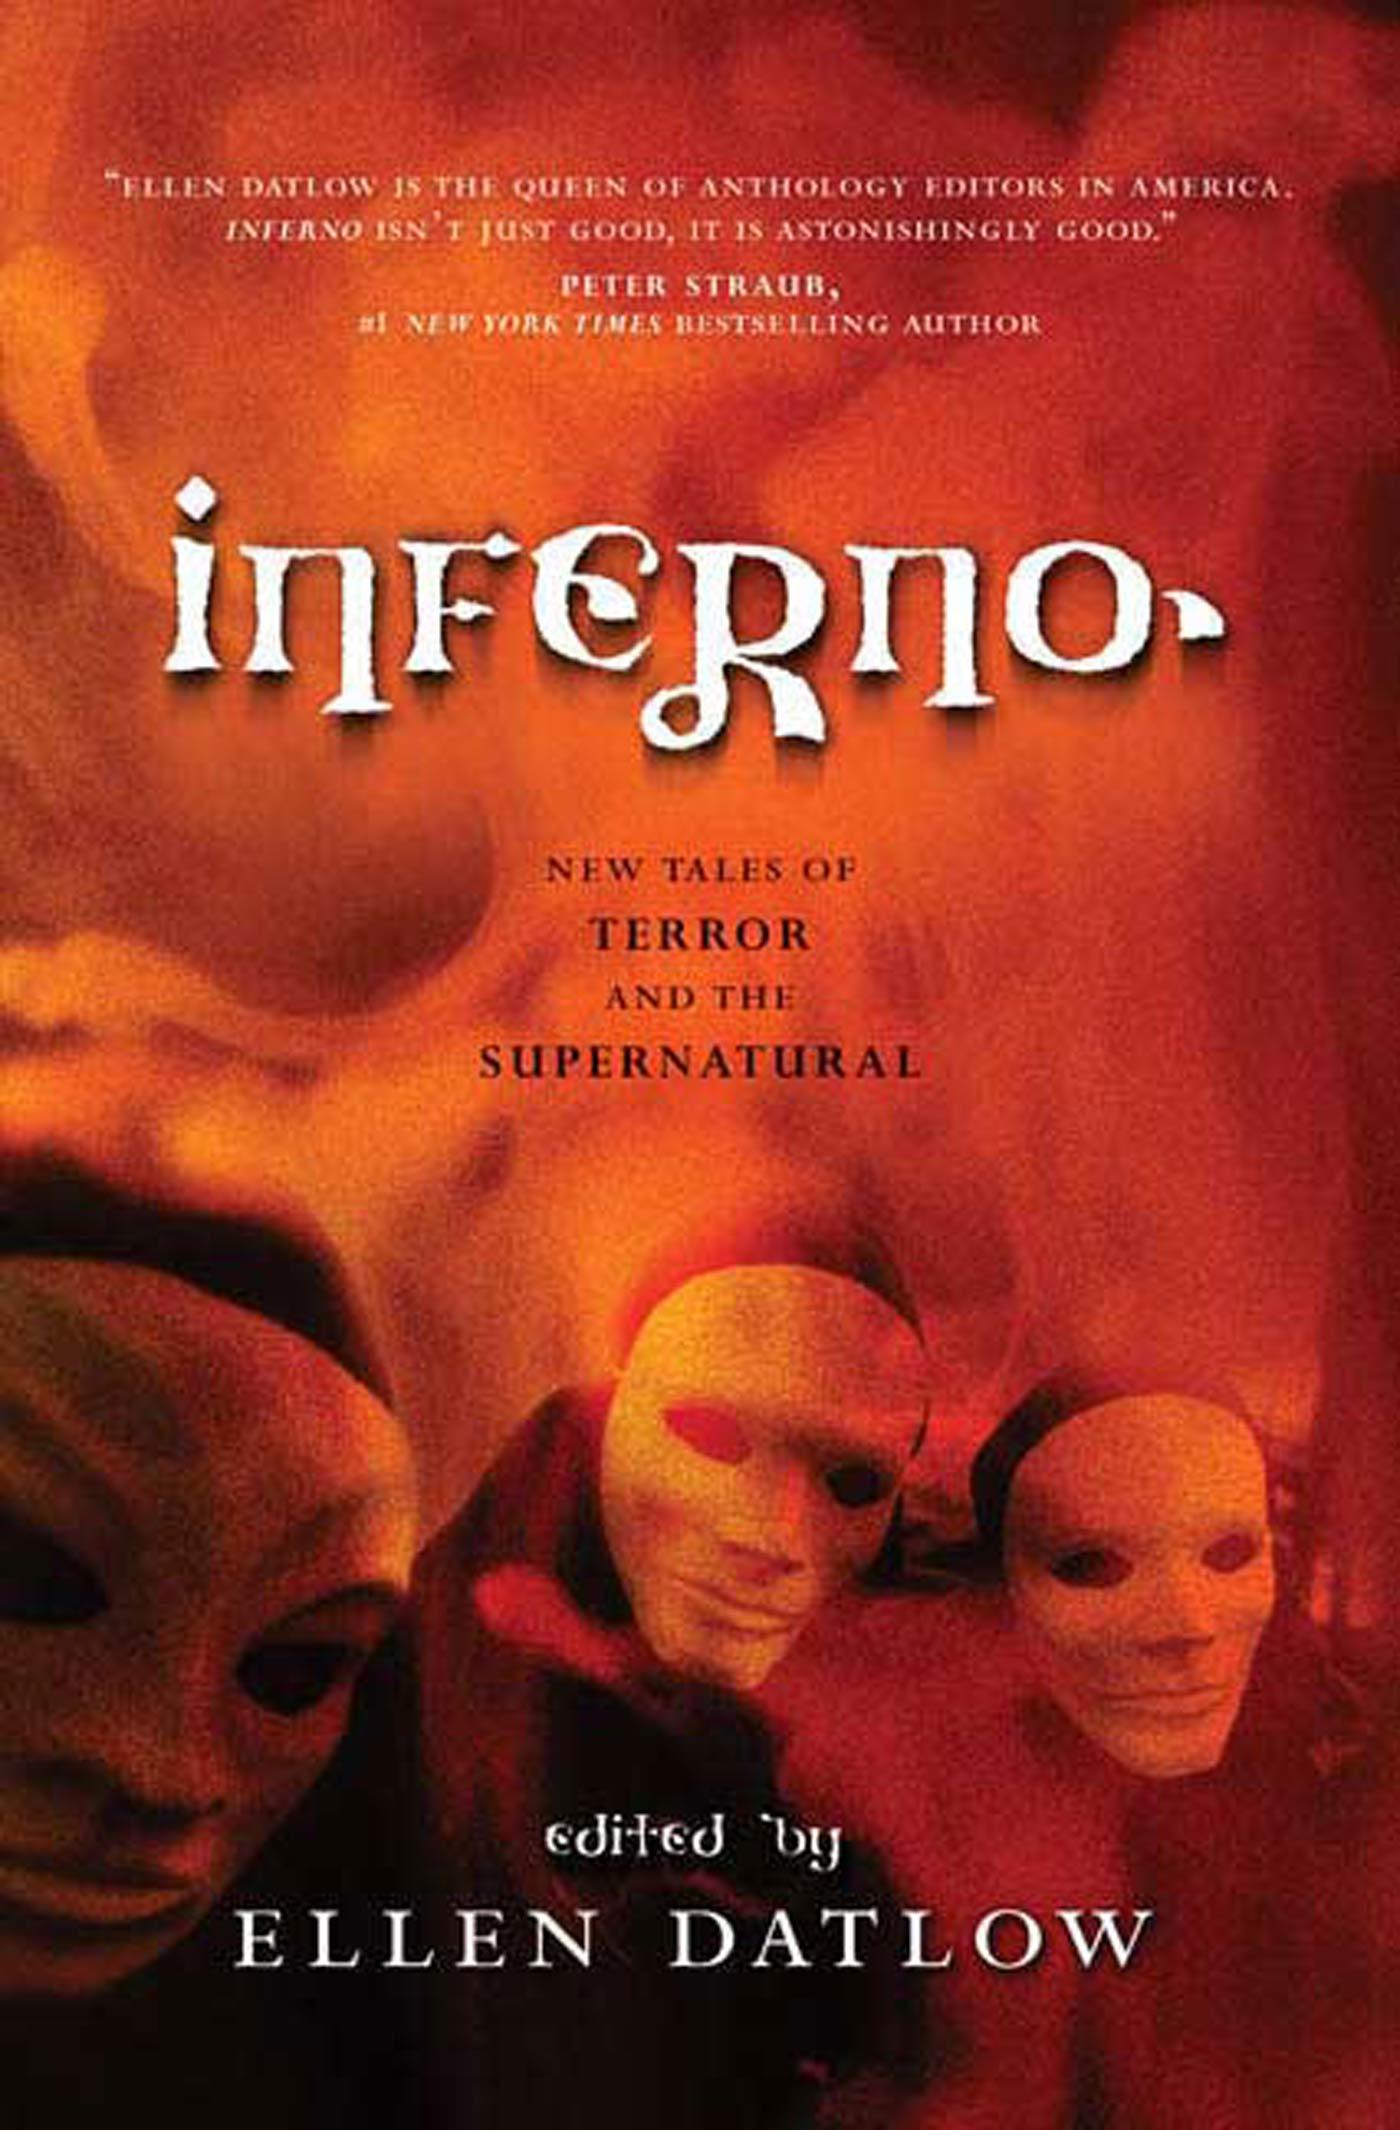 New Tales of Terror and the Supernatural - Ellen Datlow